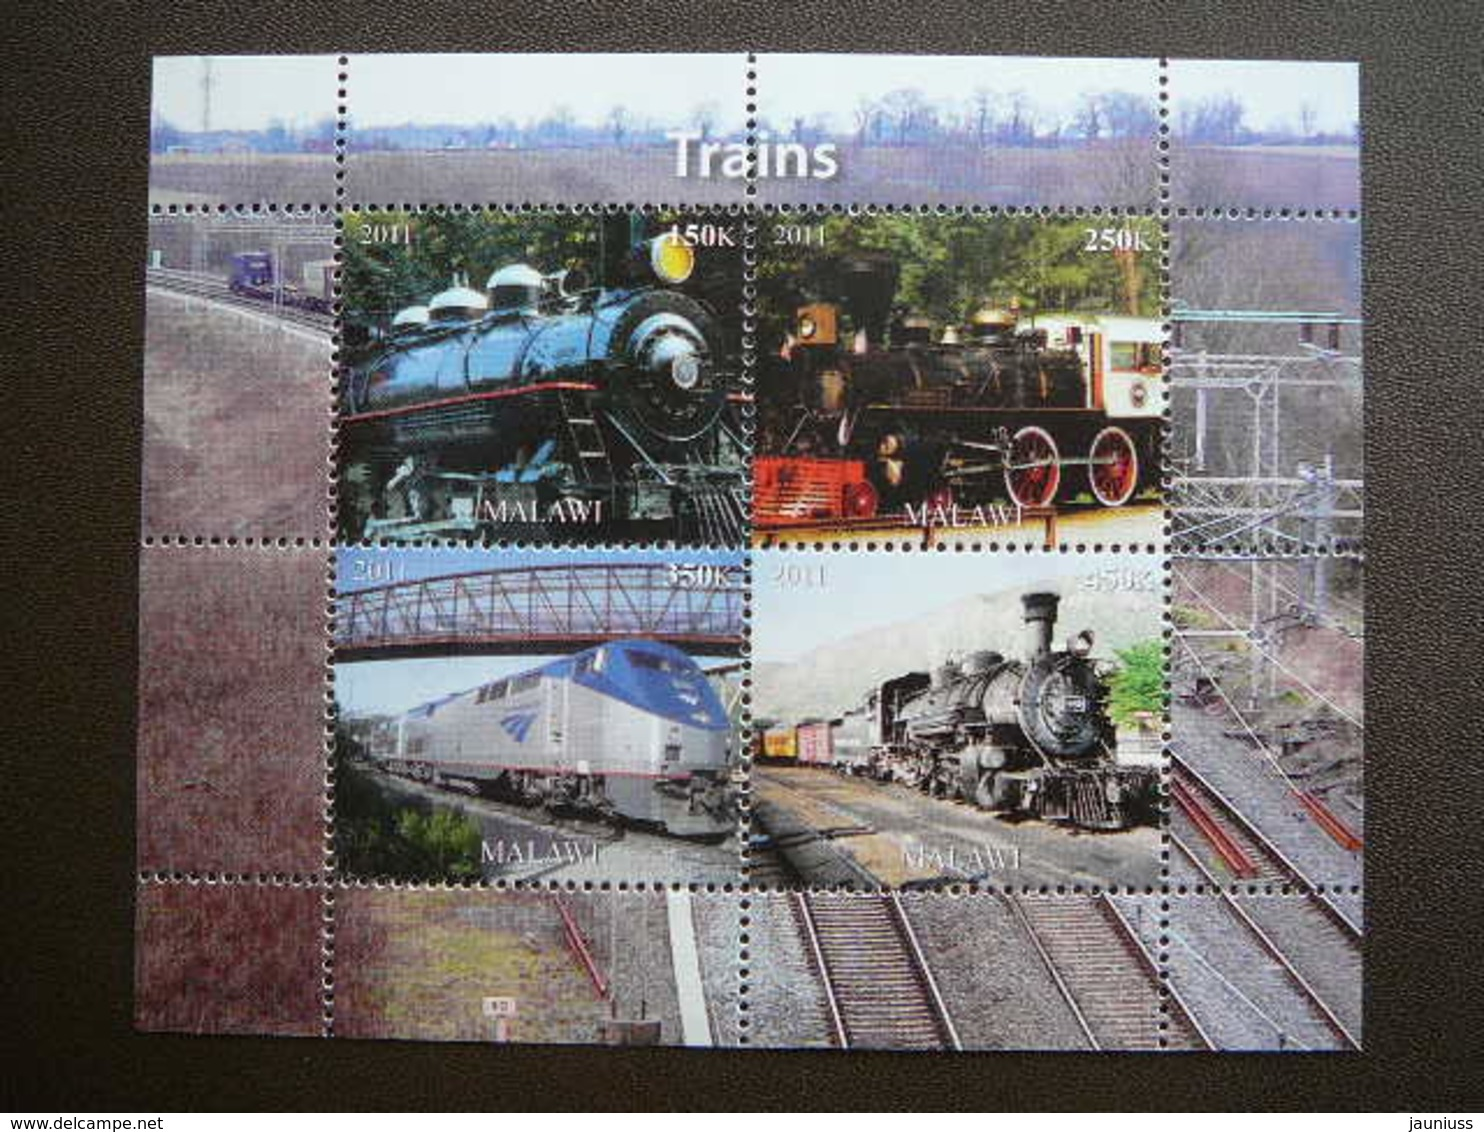 Trains. Züge. Vapeurs # 2011 MNH S/s # (1862) # Locomotives Transport - Treinen